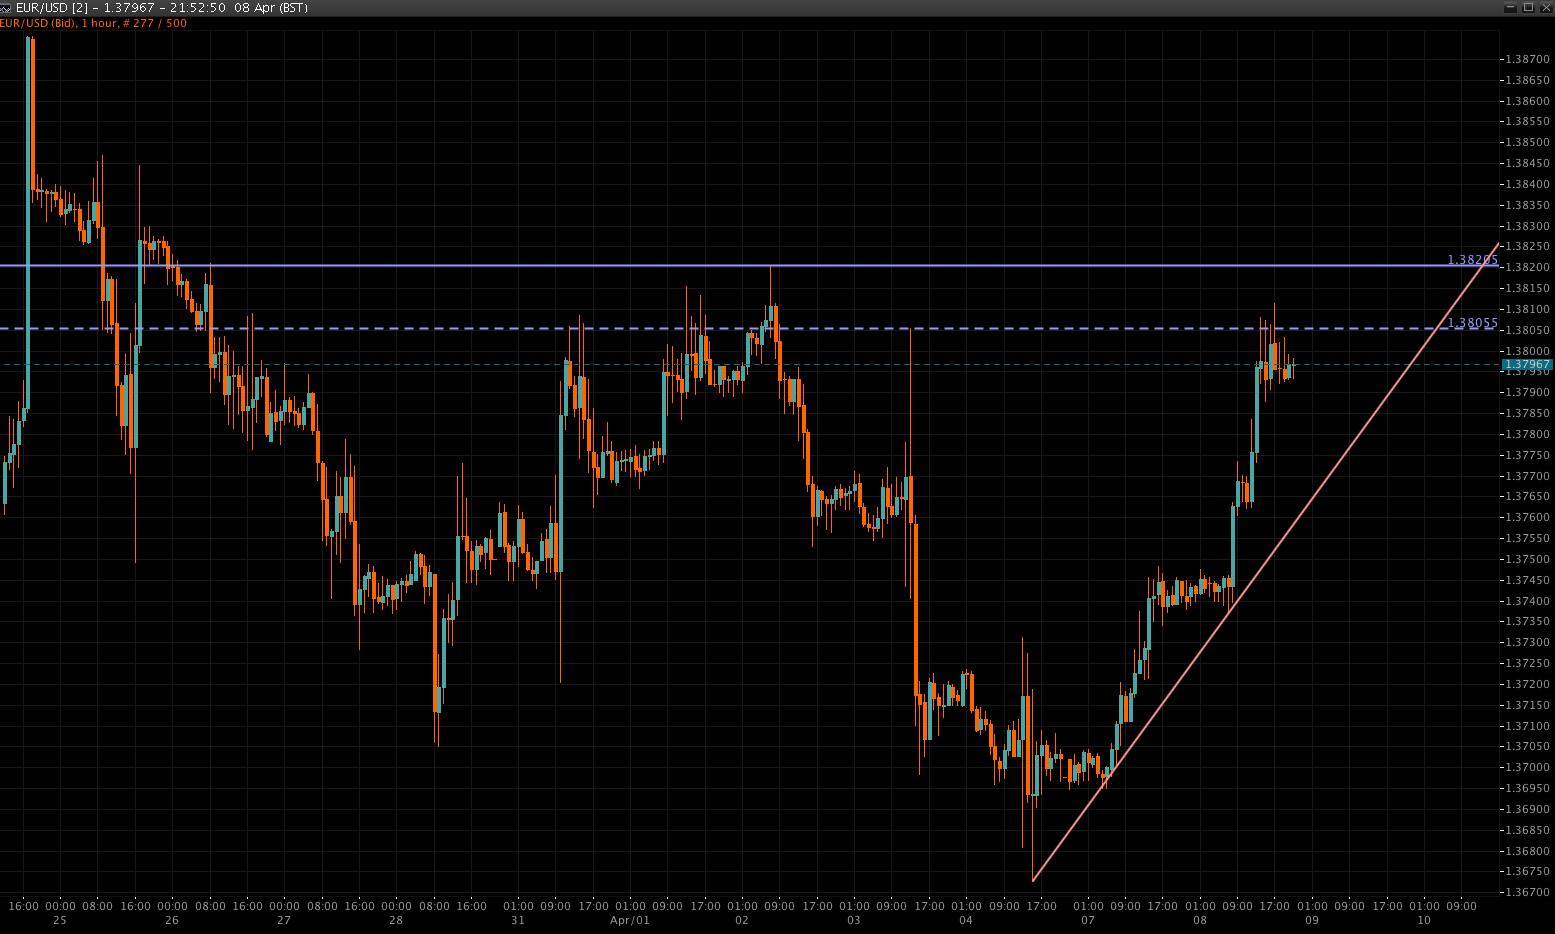 EUR/USD Chart 9 Apr 2014